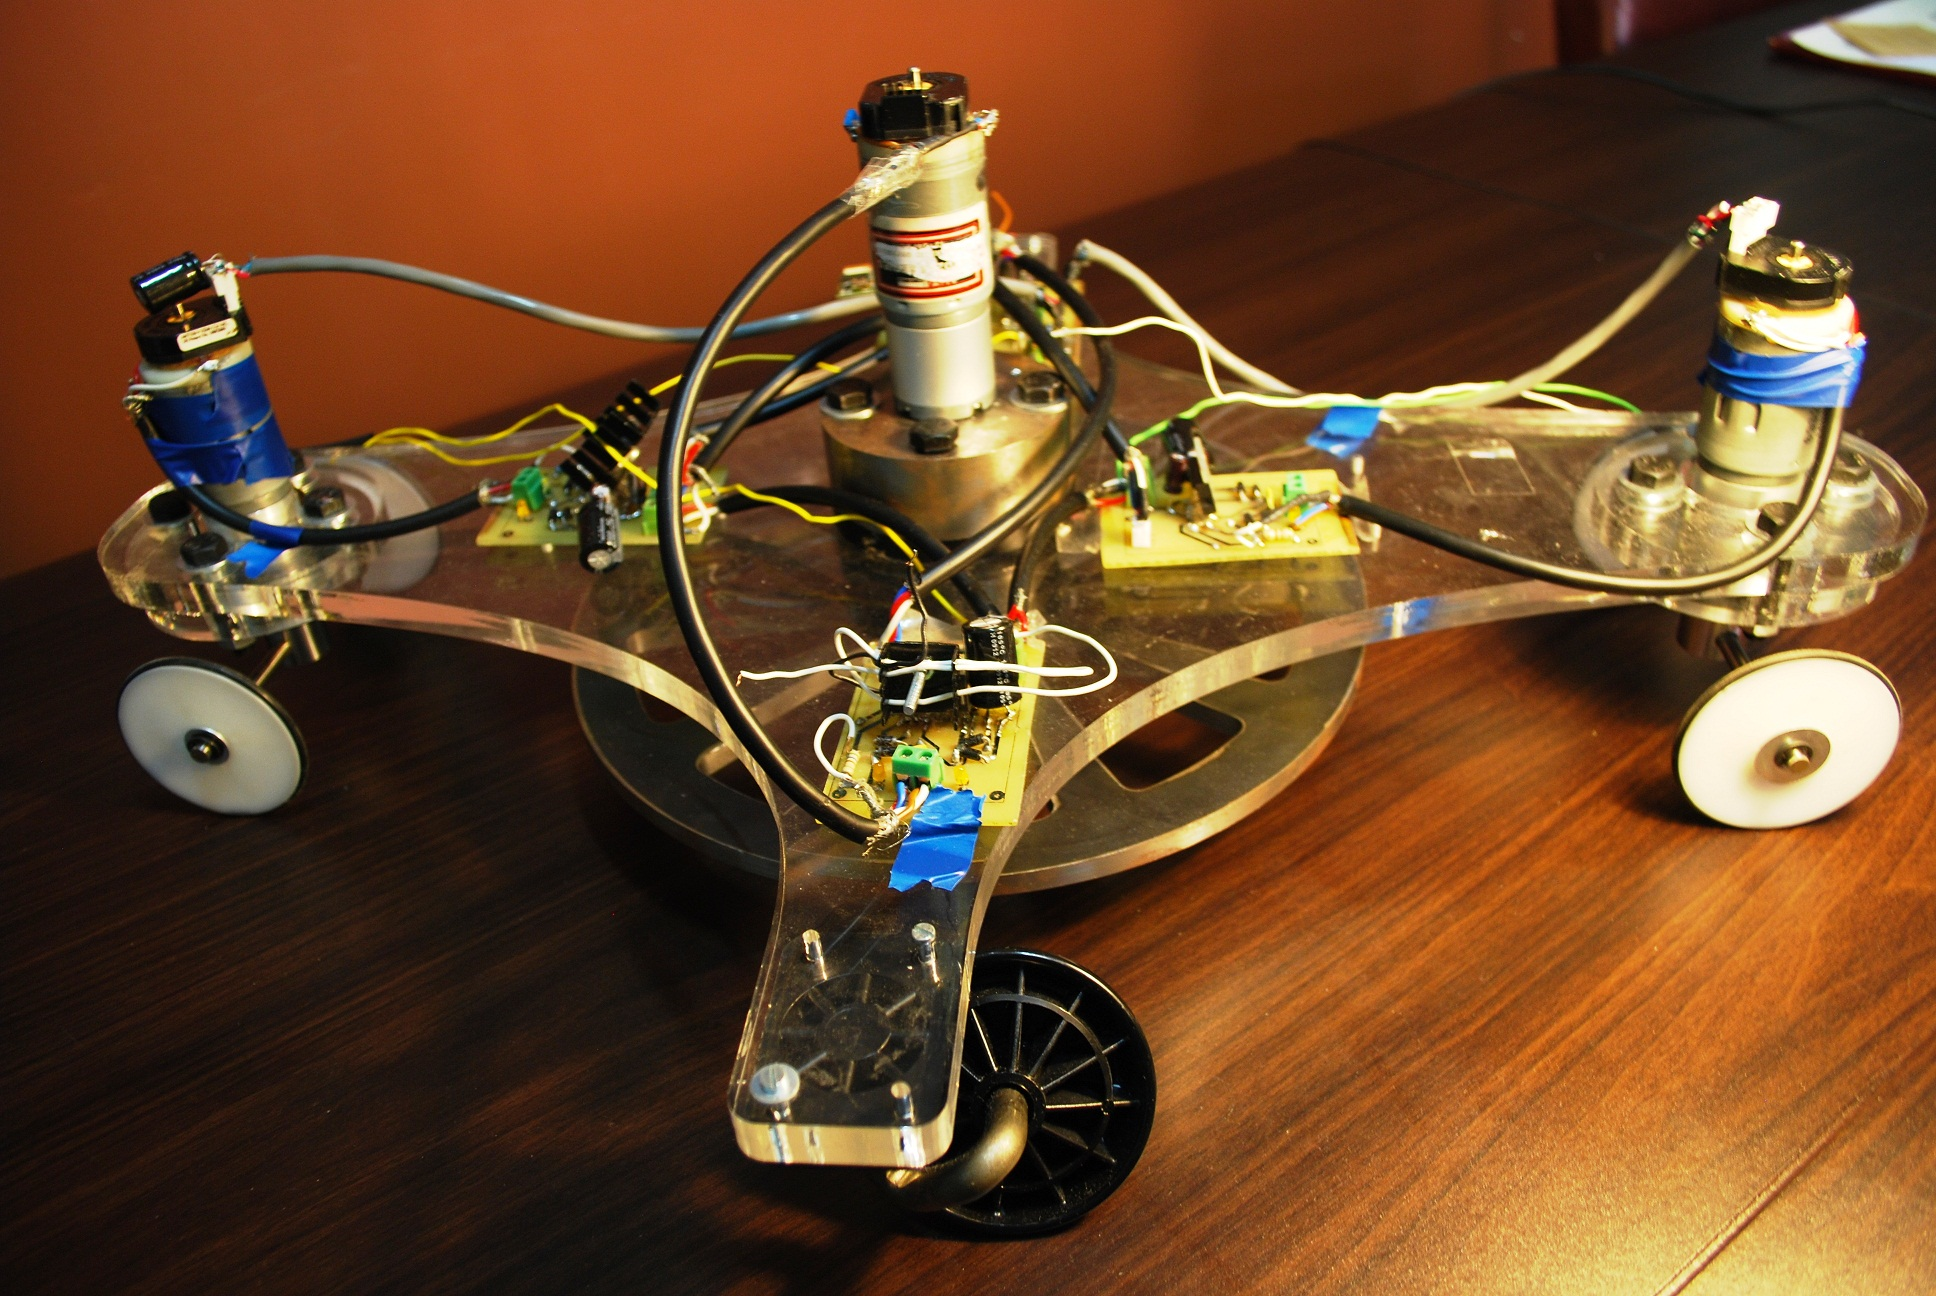 ShakerBot: A Snakeboard Robot